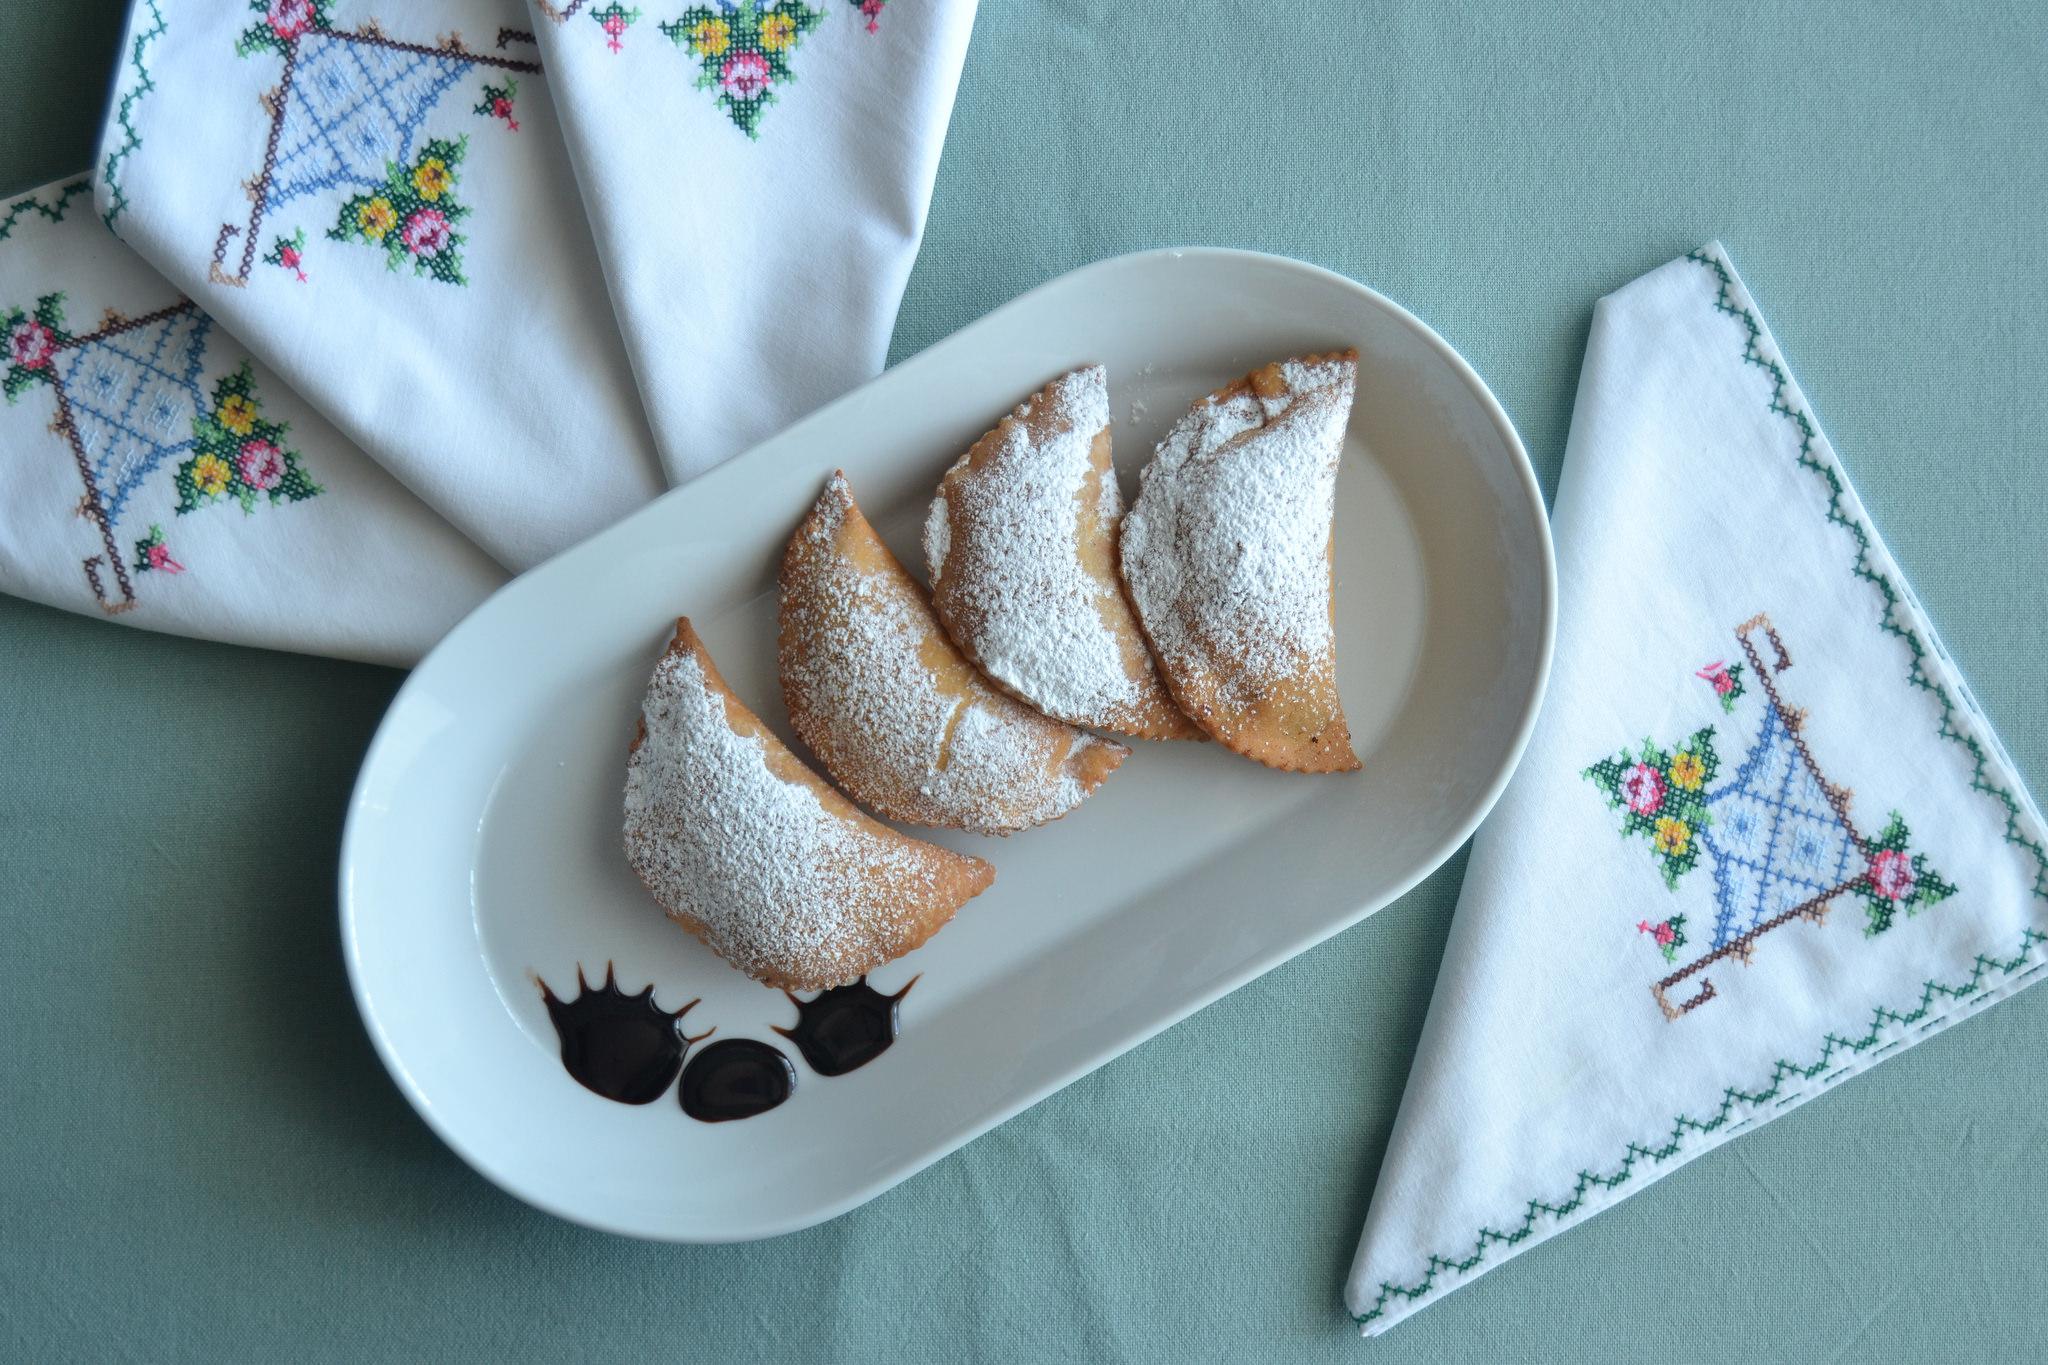 Ravioli dolci di ricotta bimby tm31 tm5 for Ricette dolci bimby